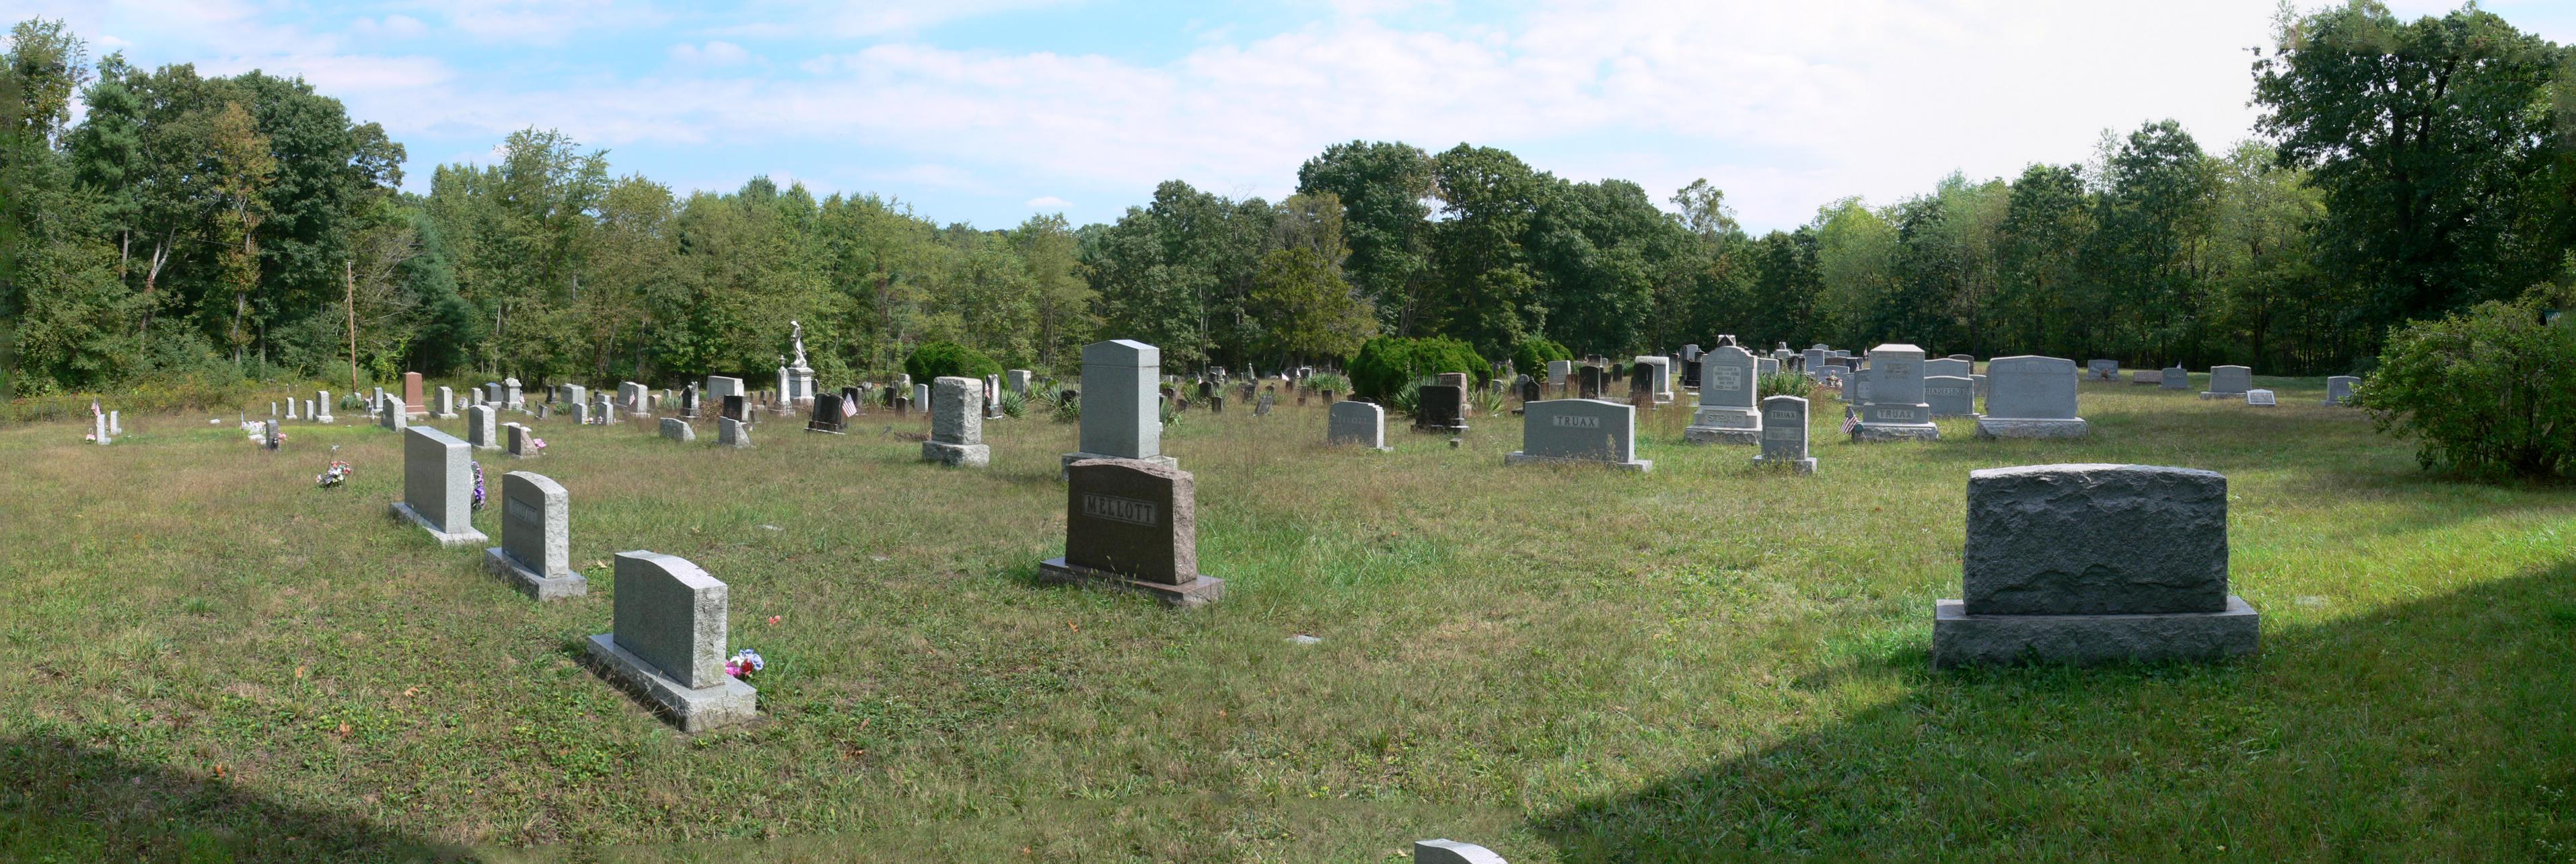 Sideling Hill Primitive Baptist Cemetery